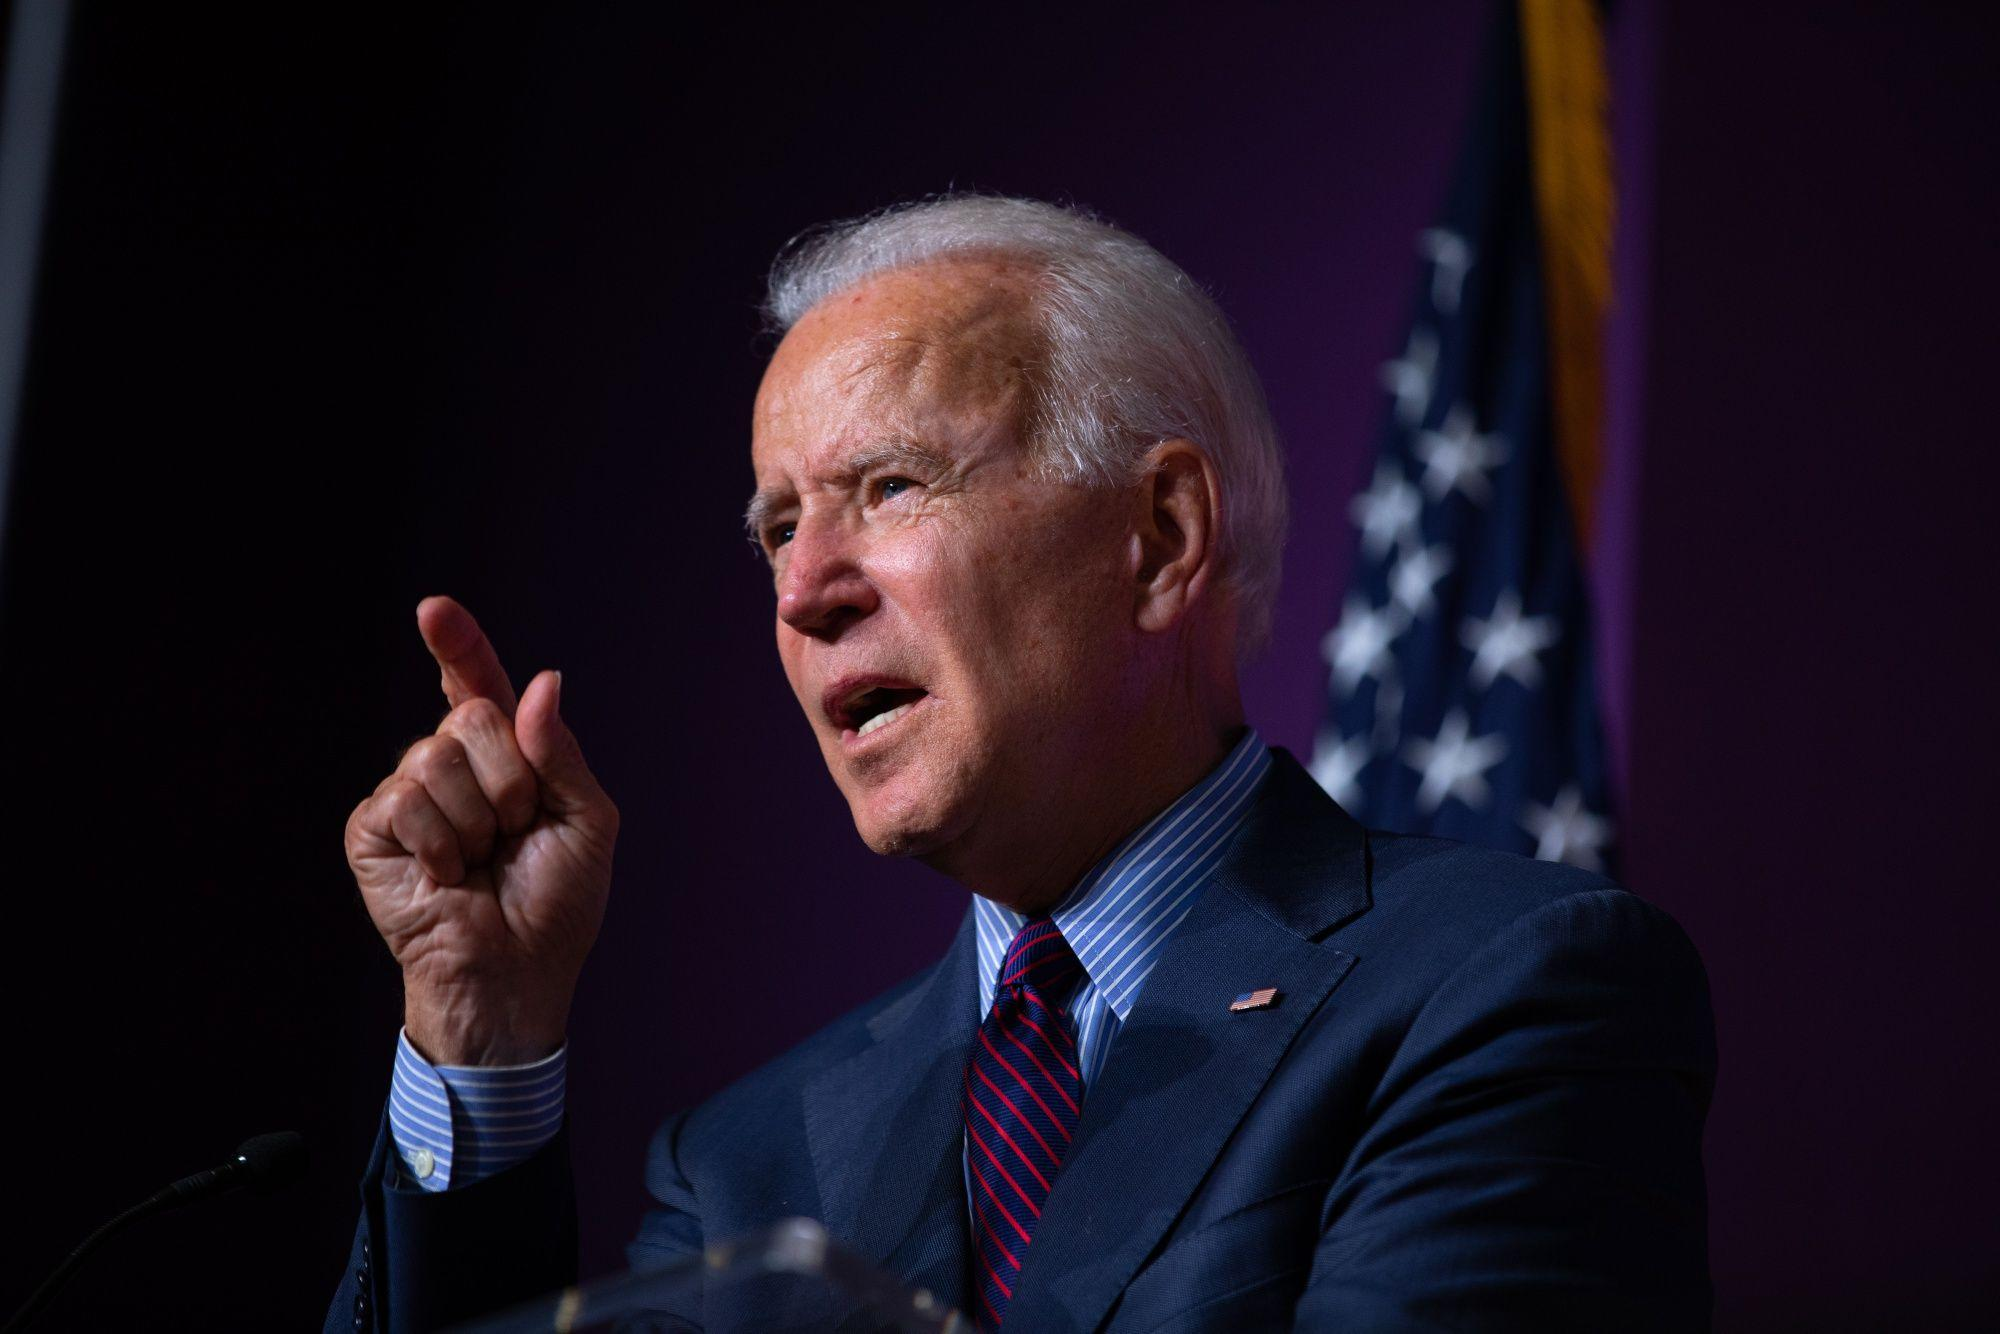 Biden Urges Trump to 'Listen to the Scientists' on Coronavirus